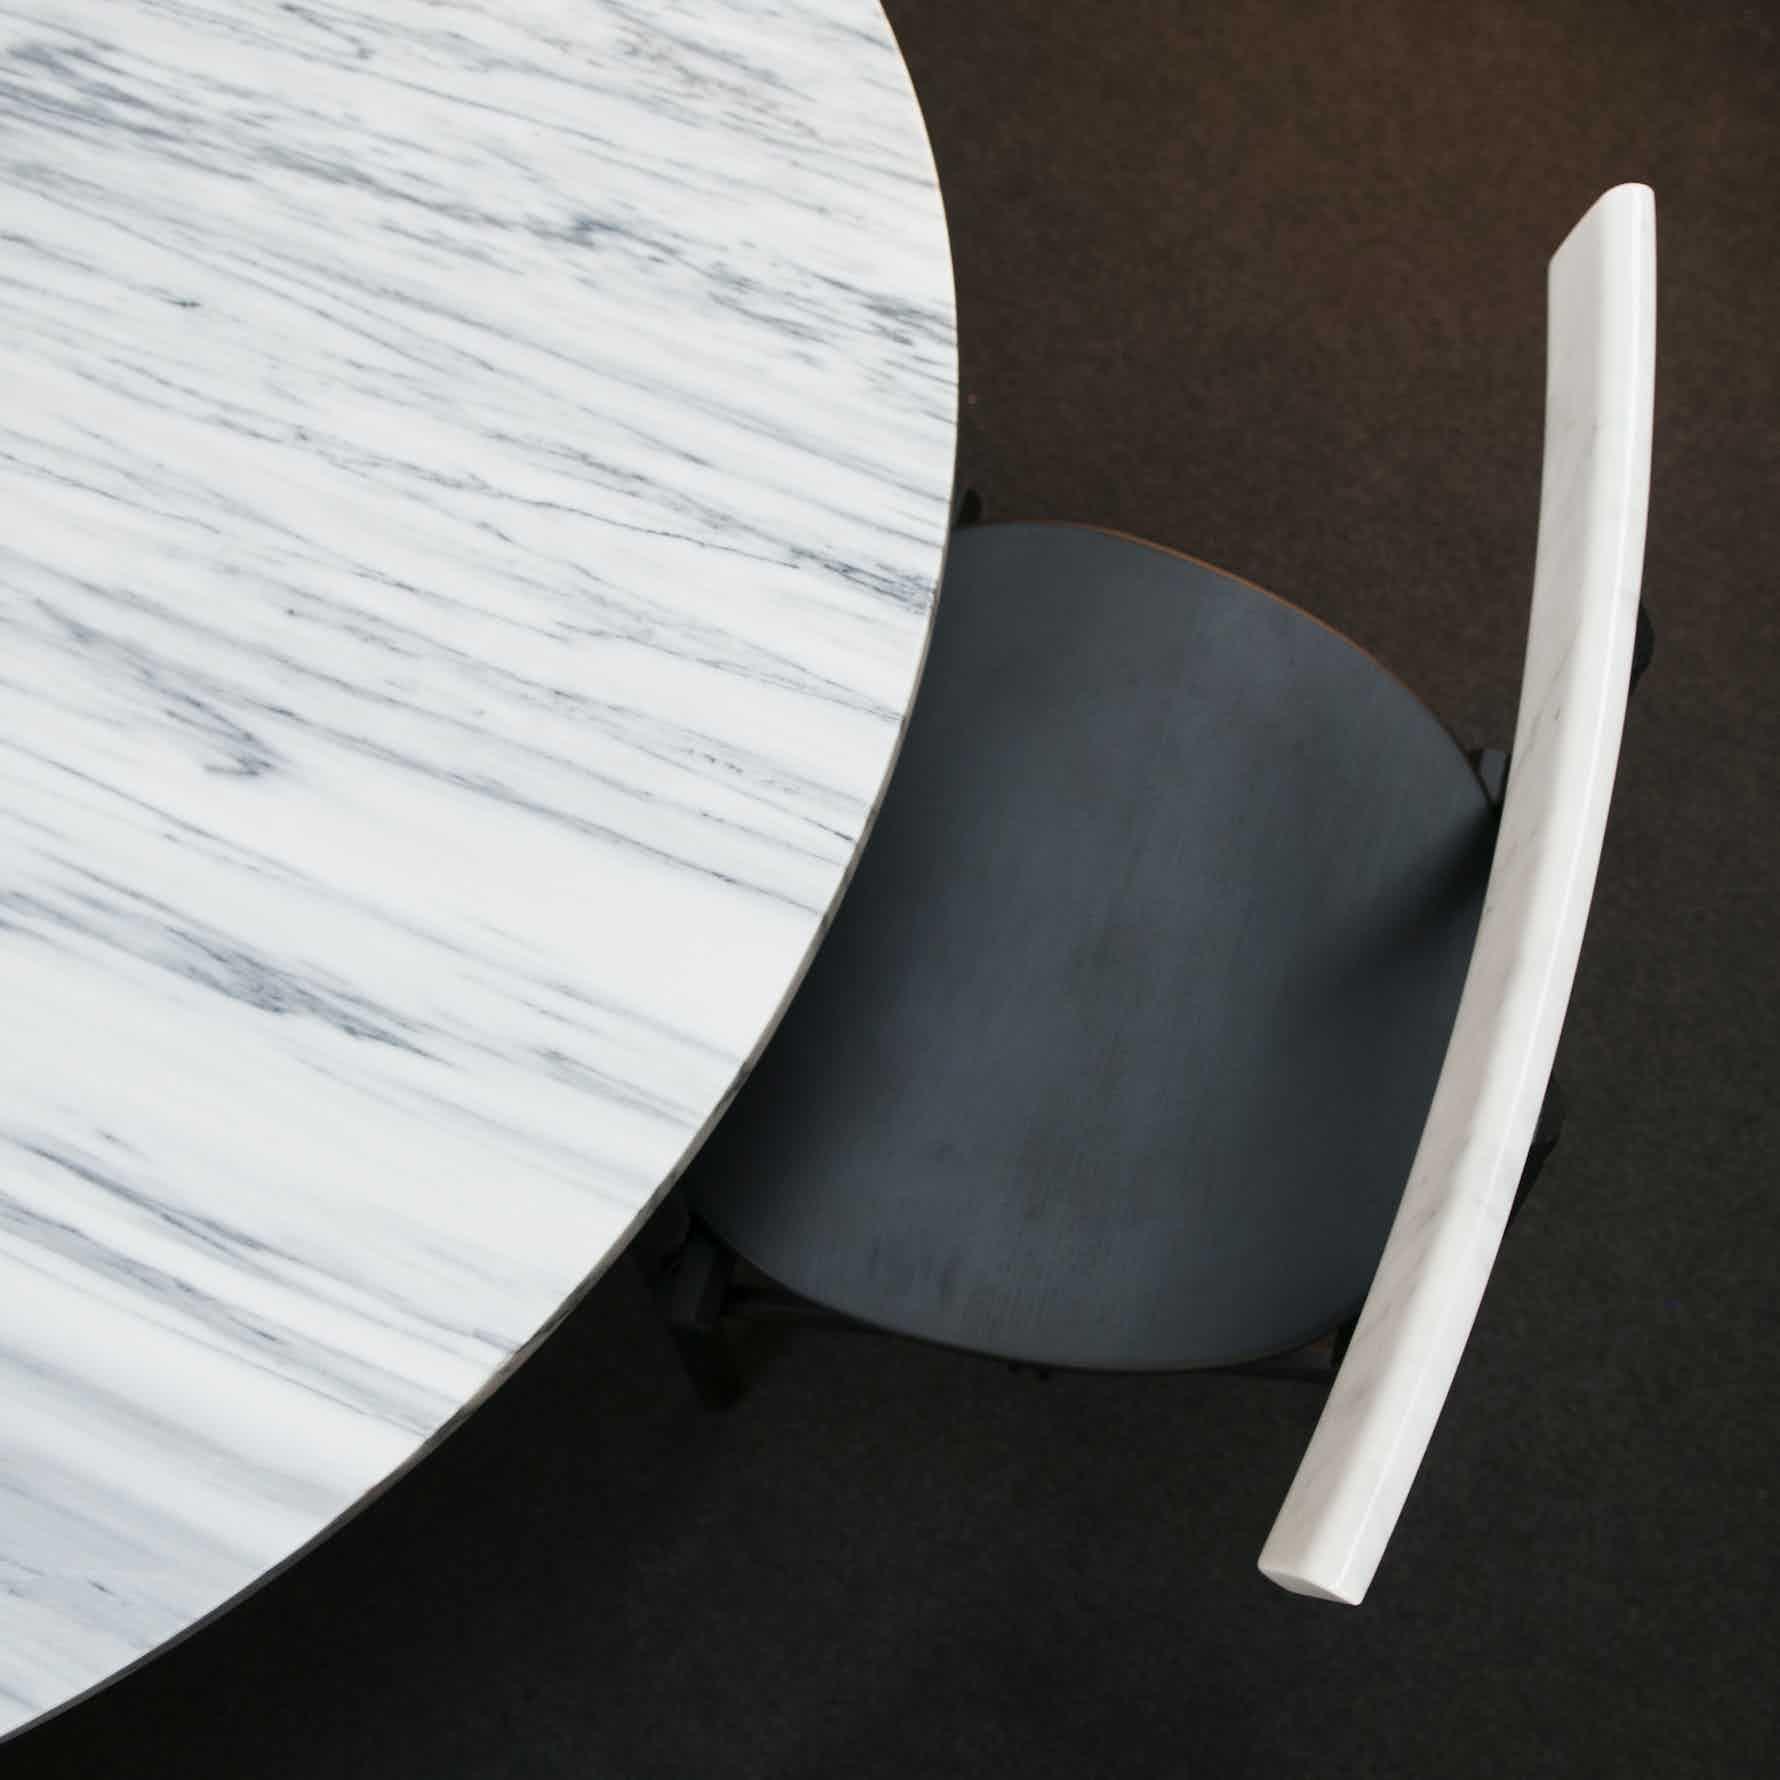 La-chance-furniture-ronin-chair-insitu-wallpaper-birds-eye-haute-living